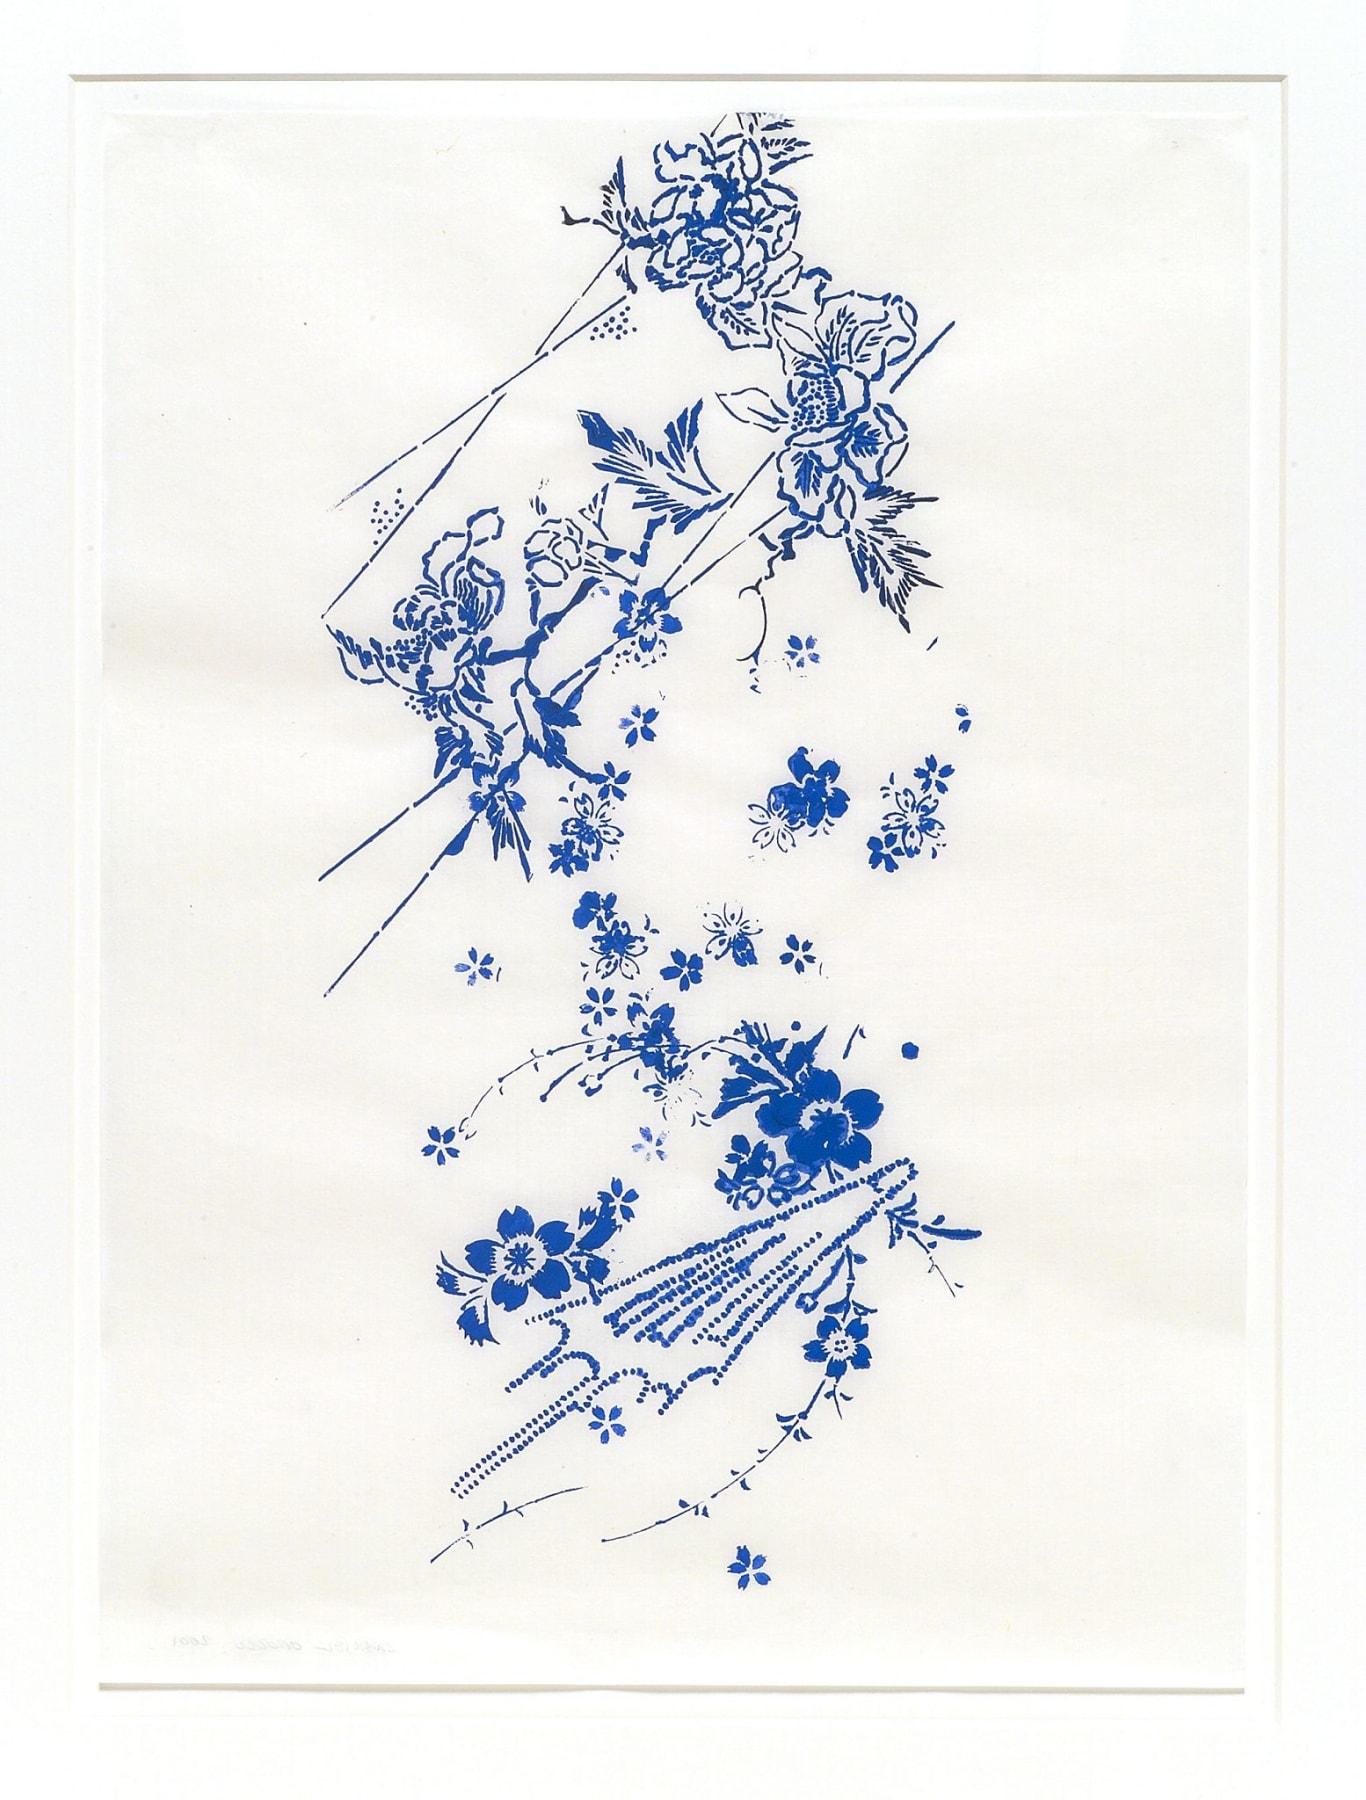 Gabriel Orozco, Katagami Prints 2, 2001